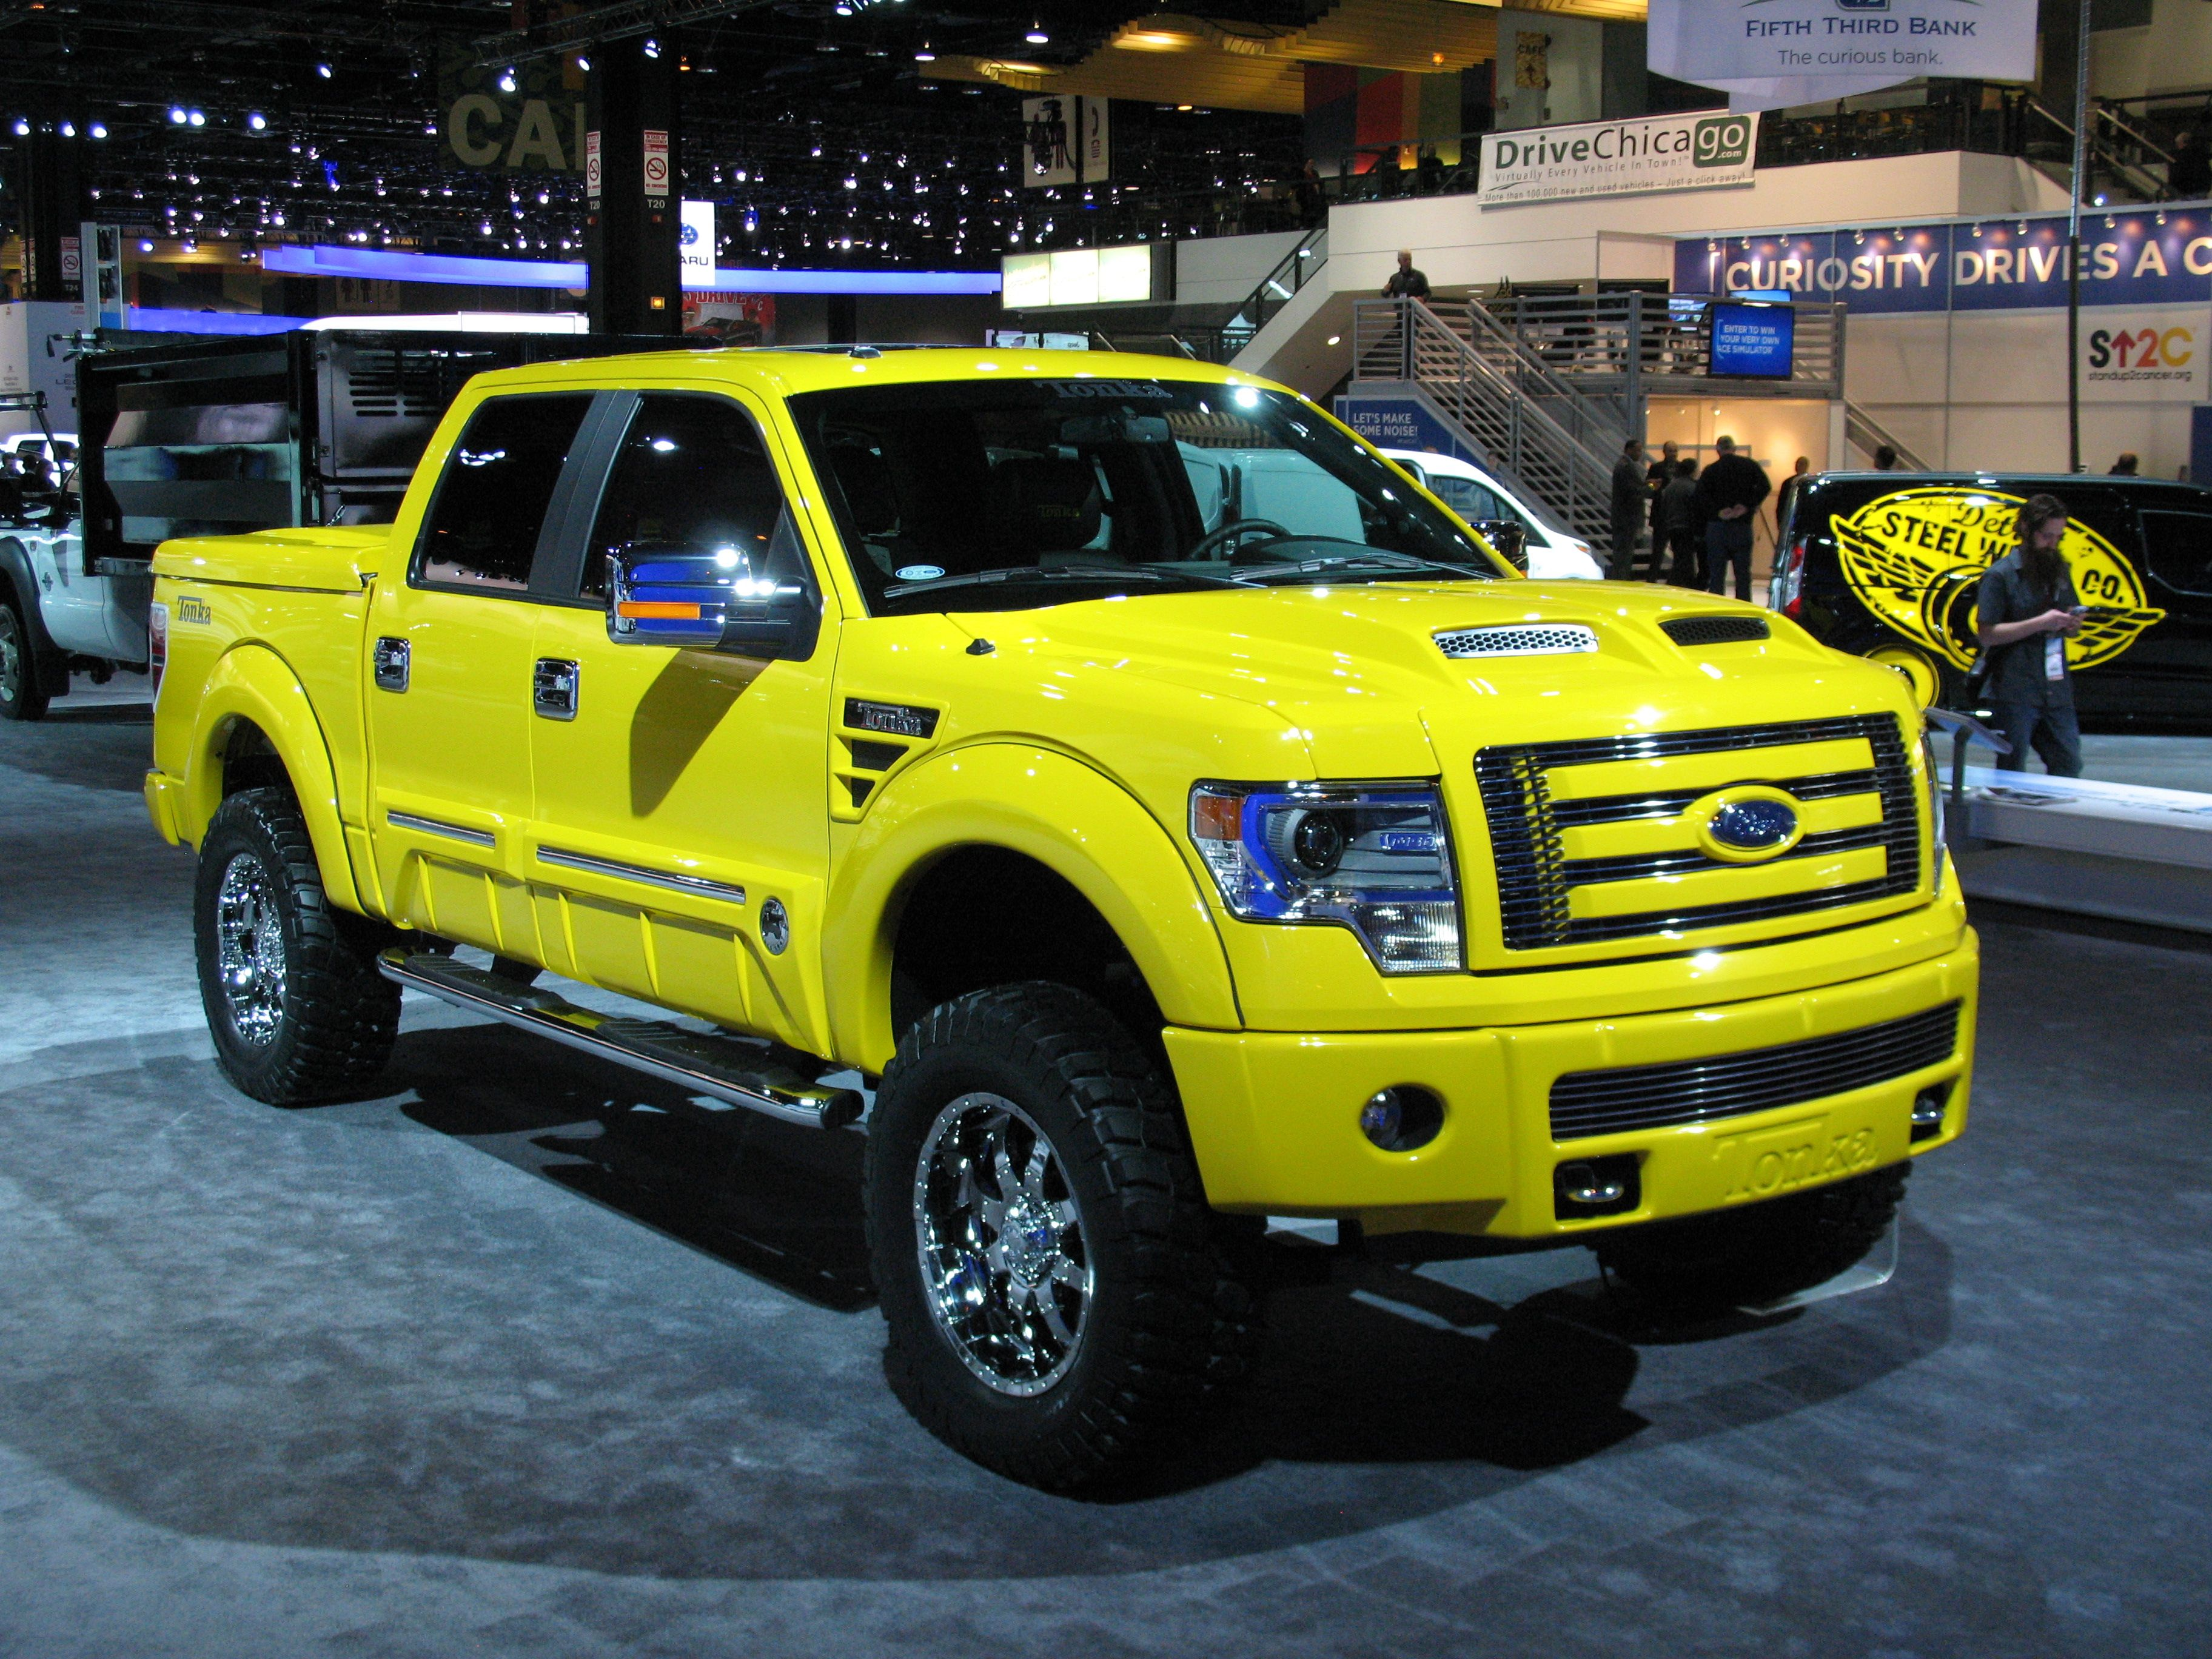 2014 ford f 150 tonka pickup truck nice rides pinterest. Black Bedroom Furniture Sets. Home Design Ideas